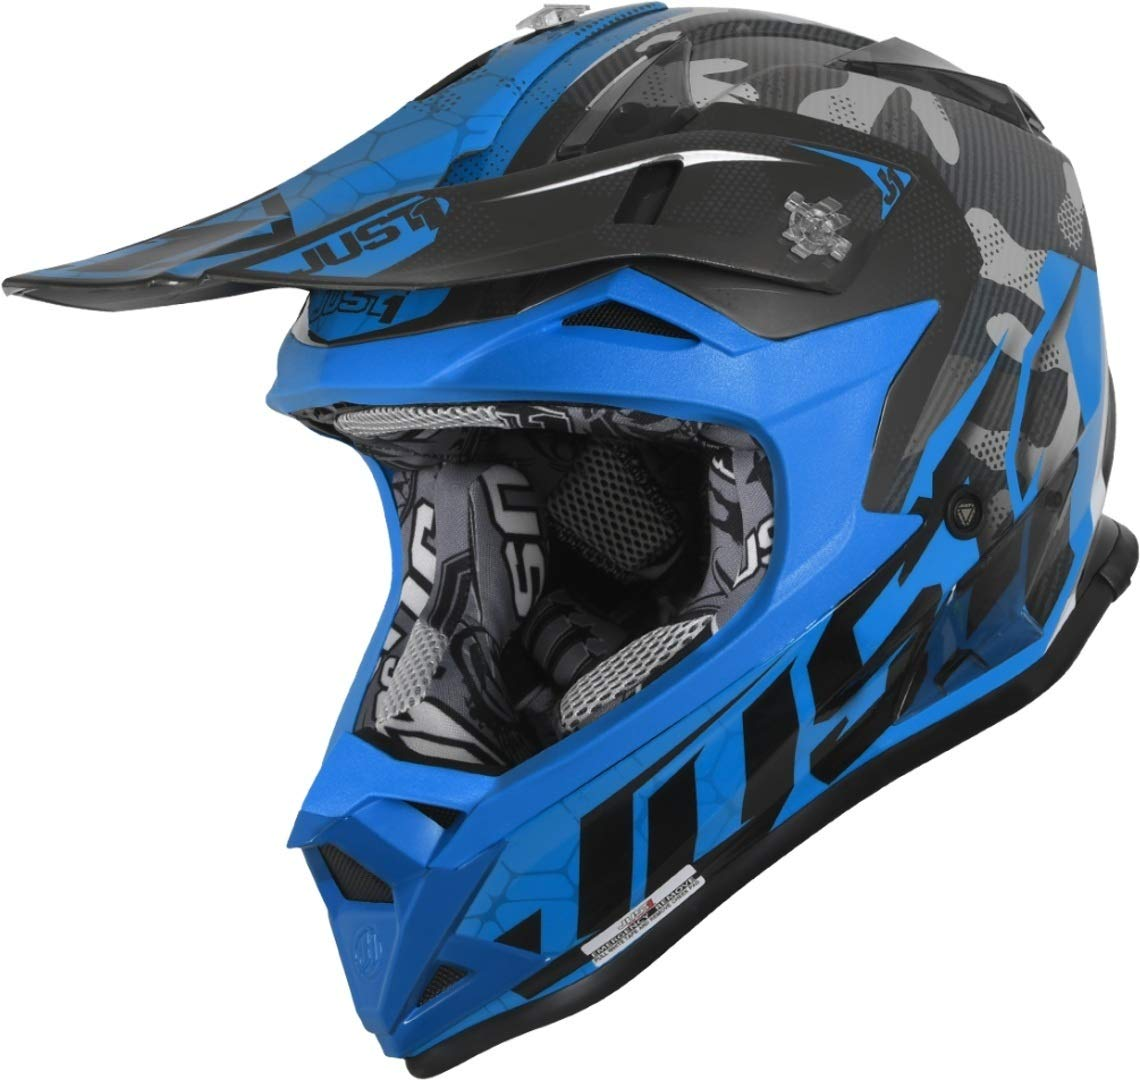 Motodak Casco JUST1 J32 Pro Swat Camo Fluo Blu Gloss Taglia S